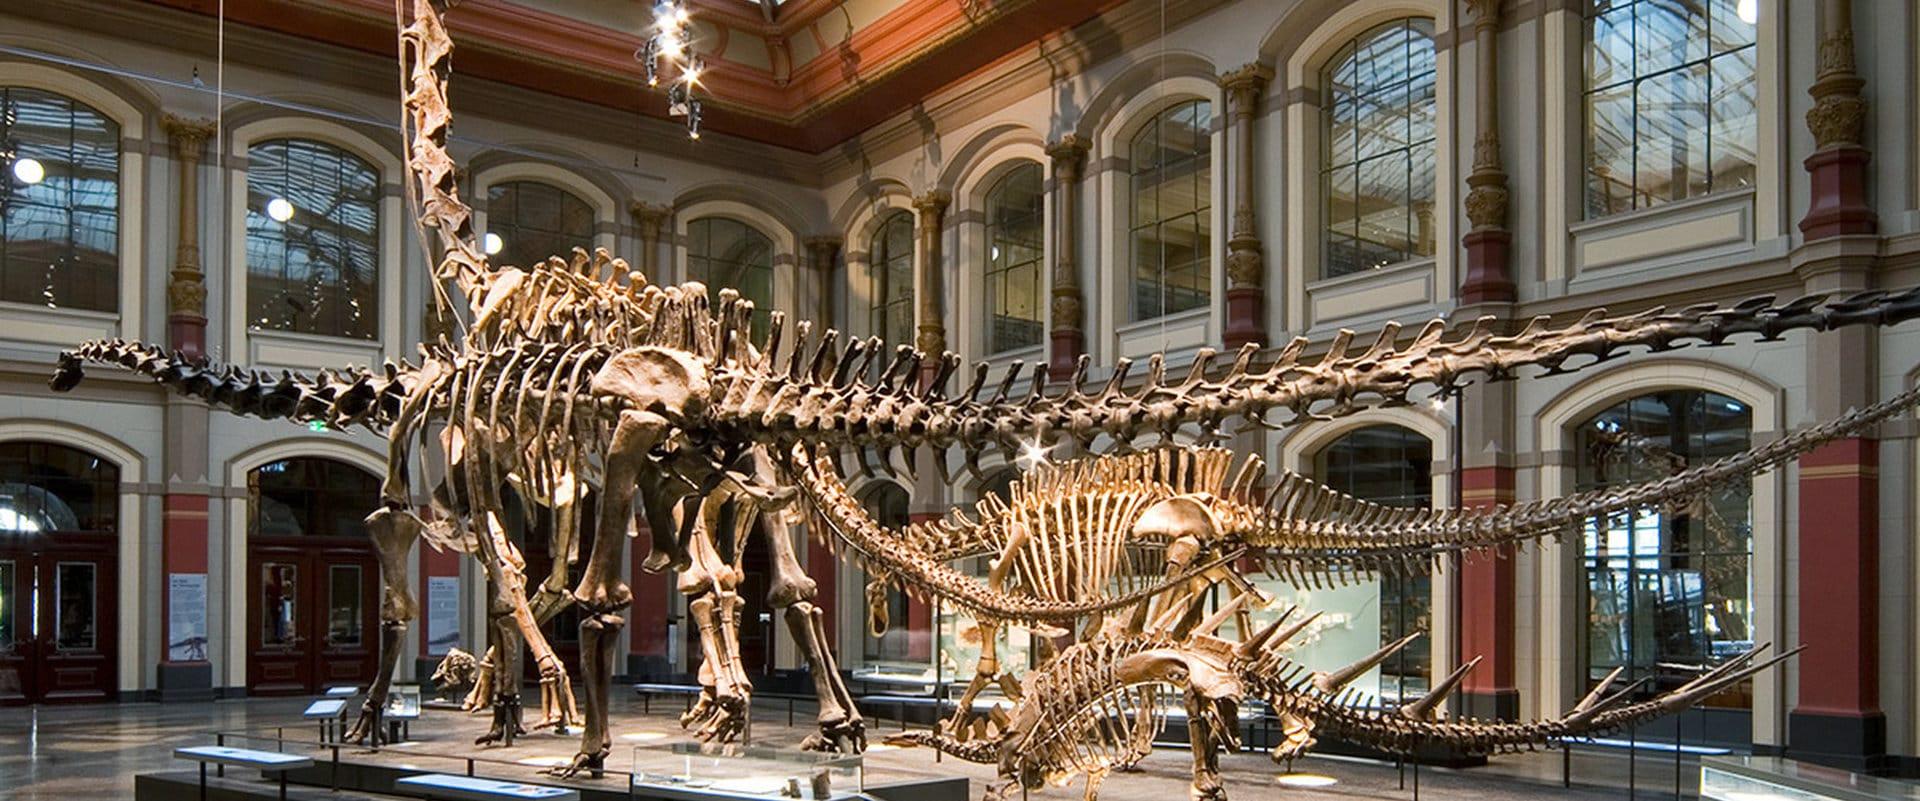 Studietur Berlin Museum fur Naturkunde